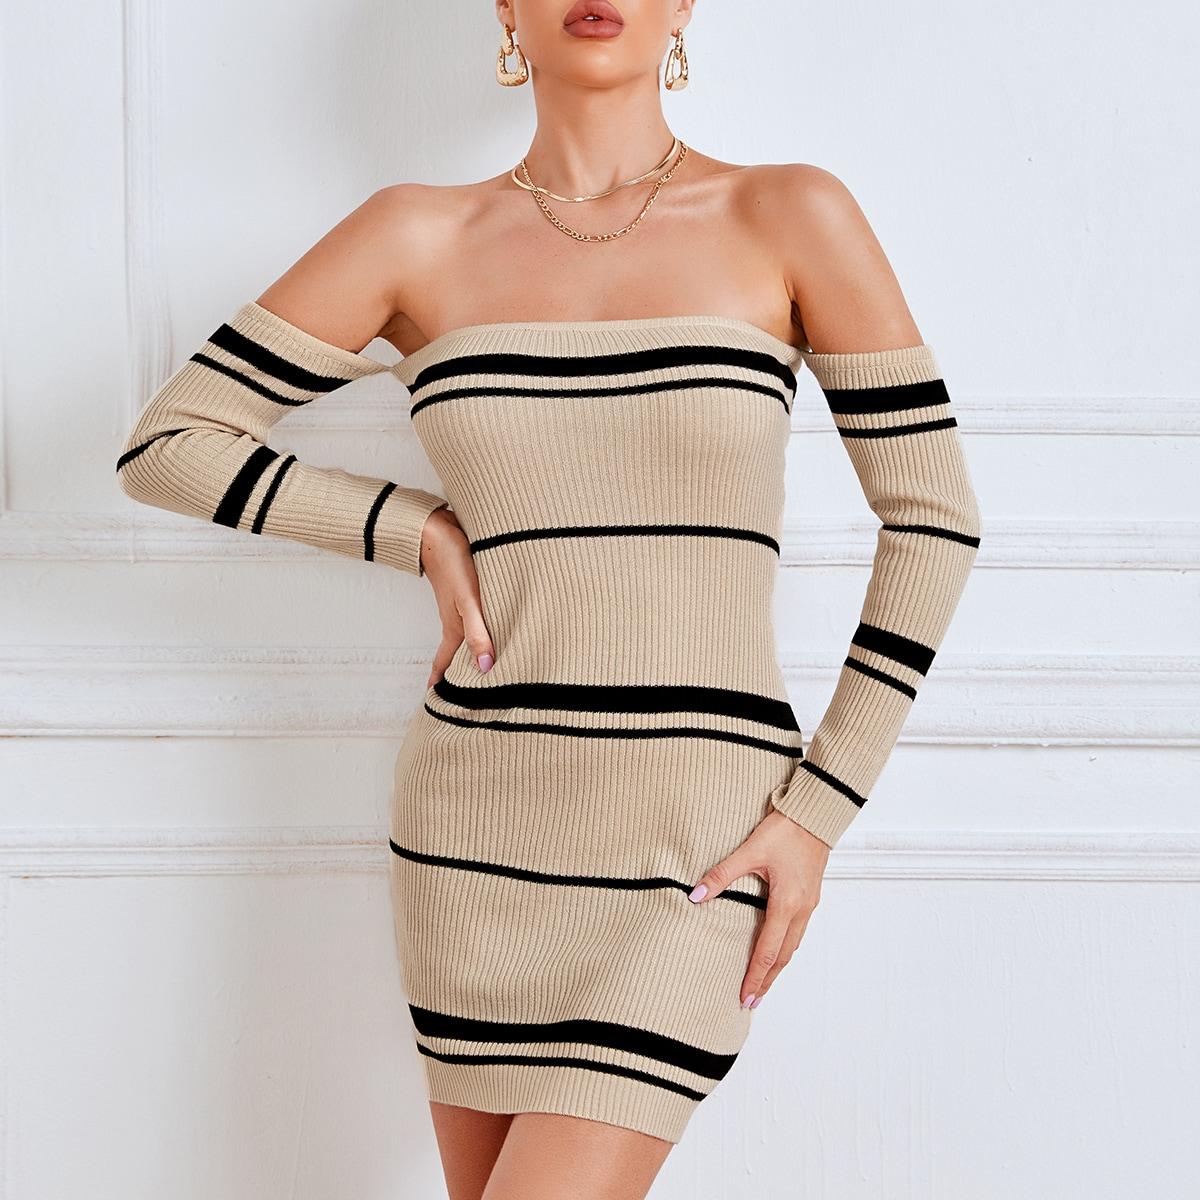 shein Elegant Gestreept Gebreide jurk